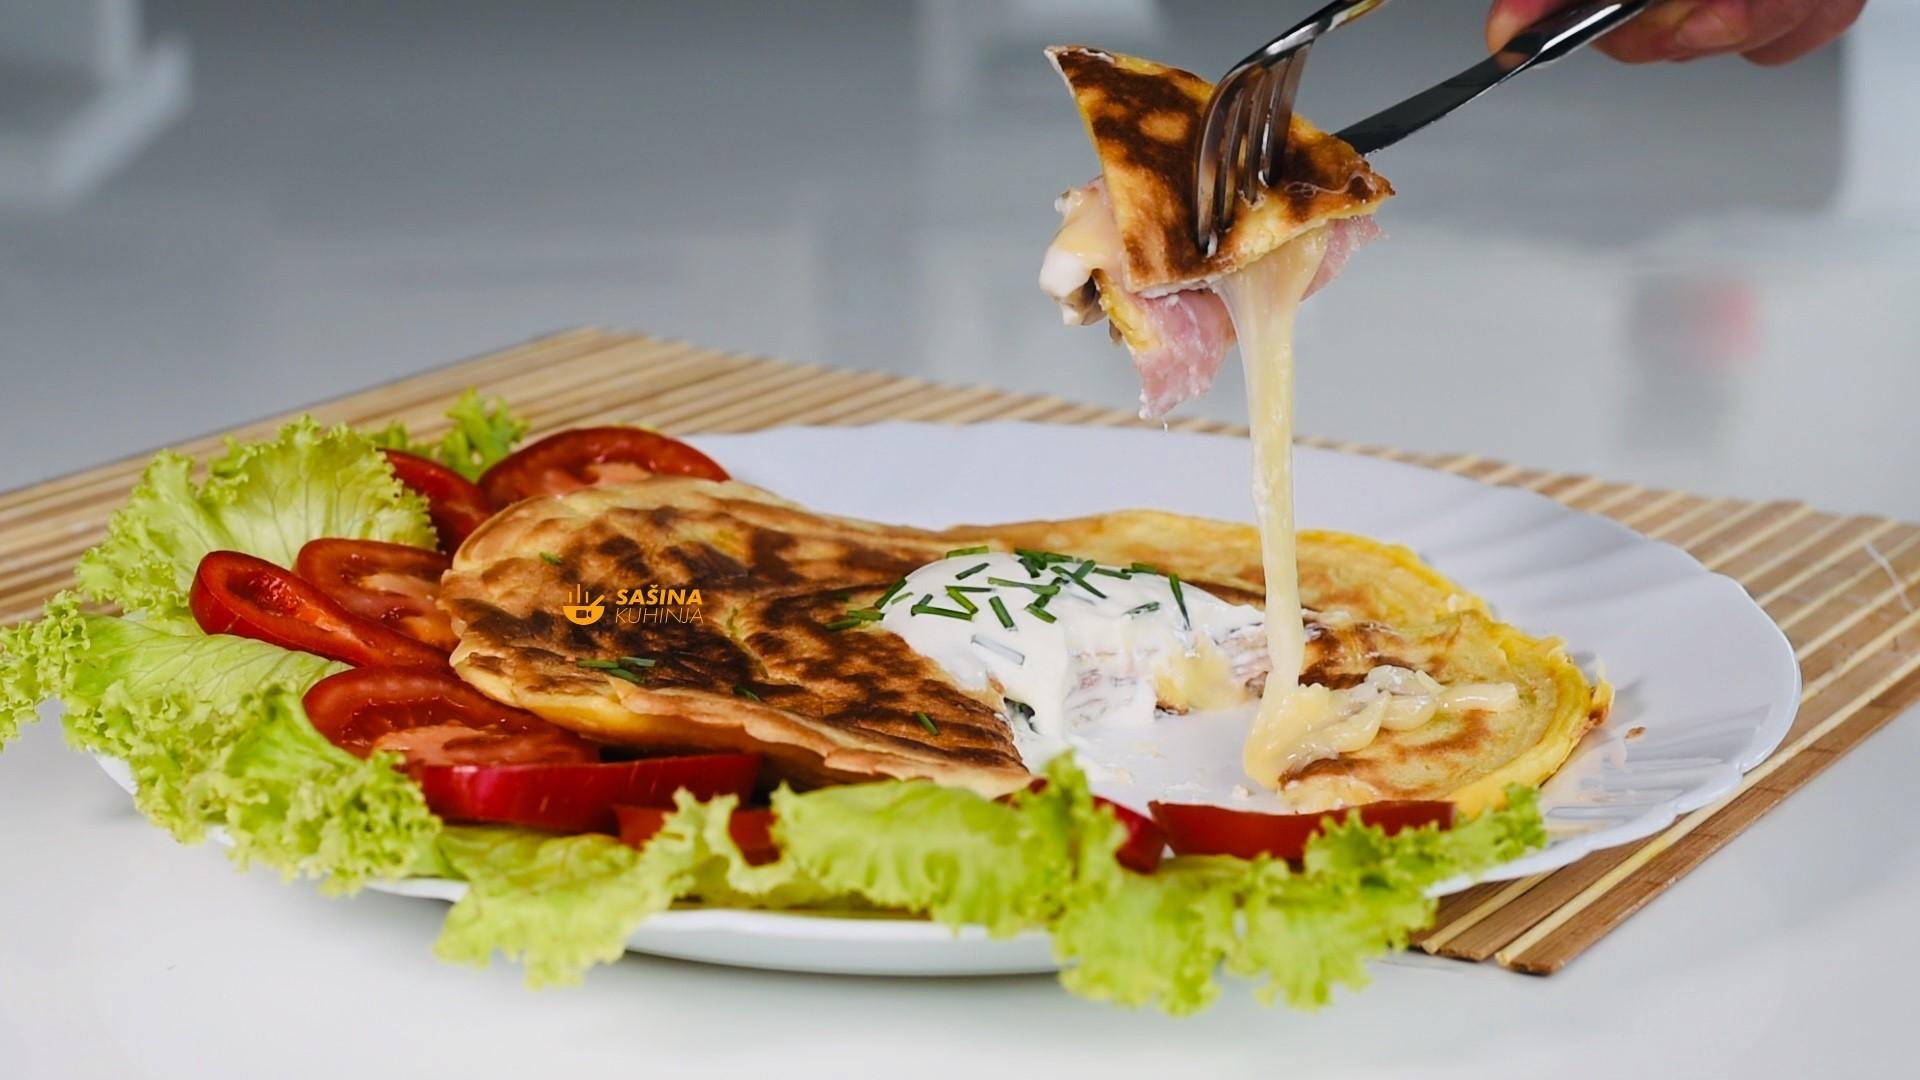 punjene palacinke sunkom sirom stuffed ham cheese crepes